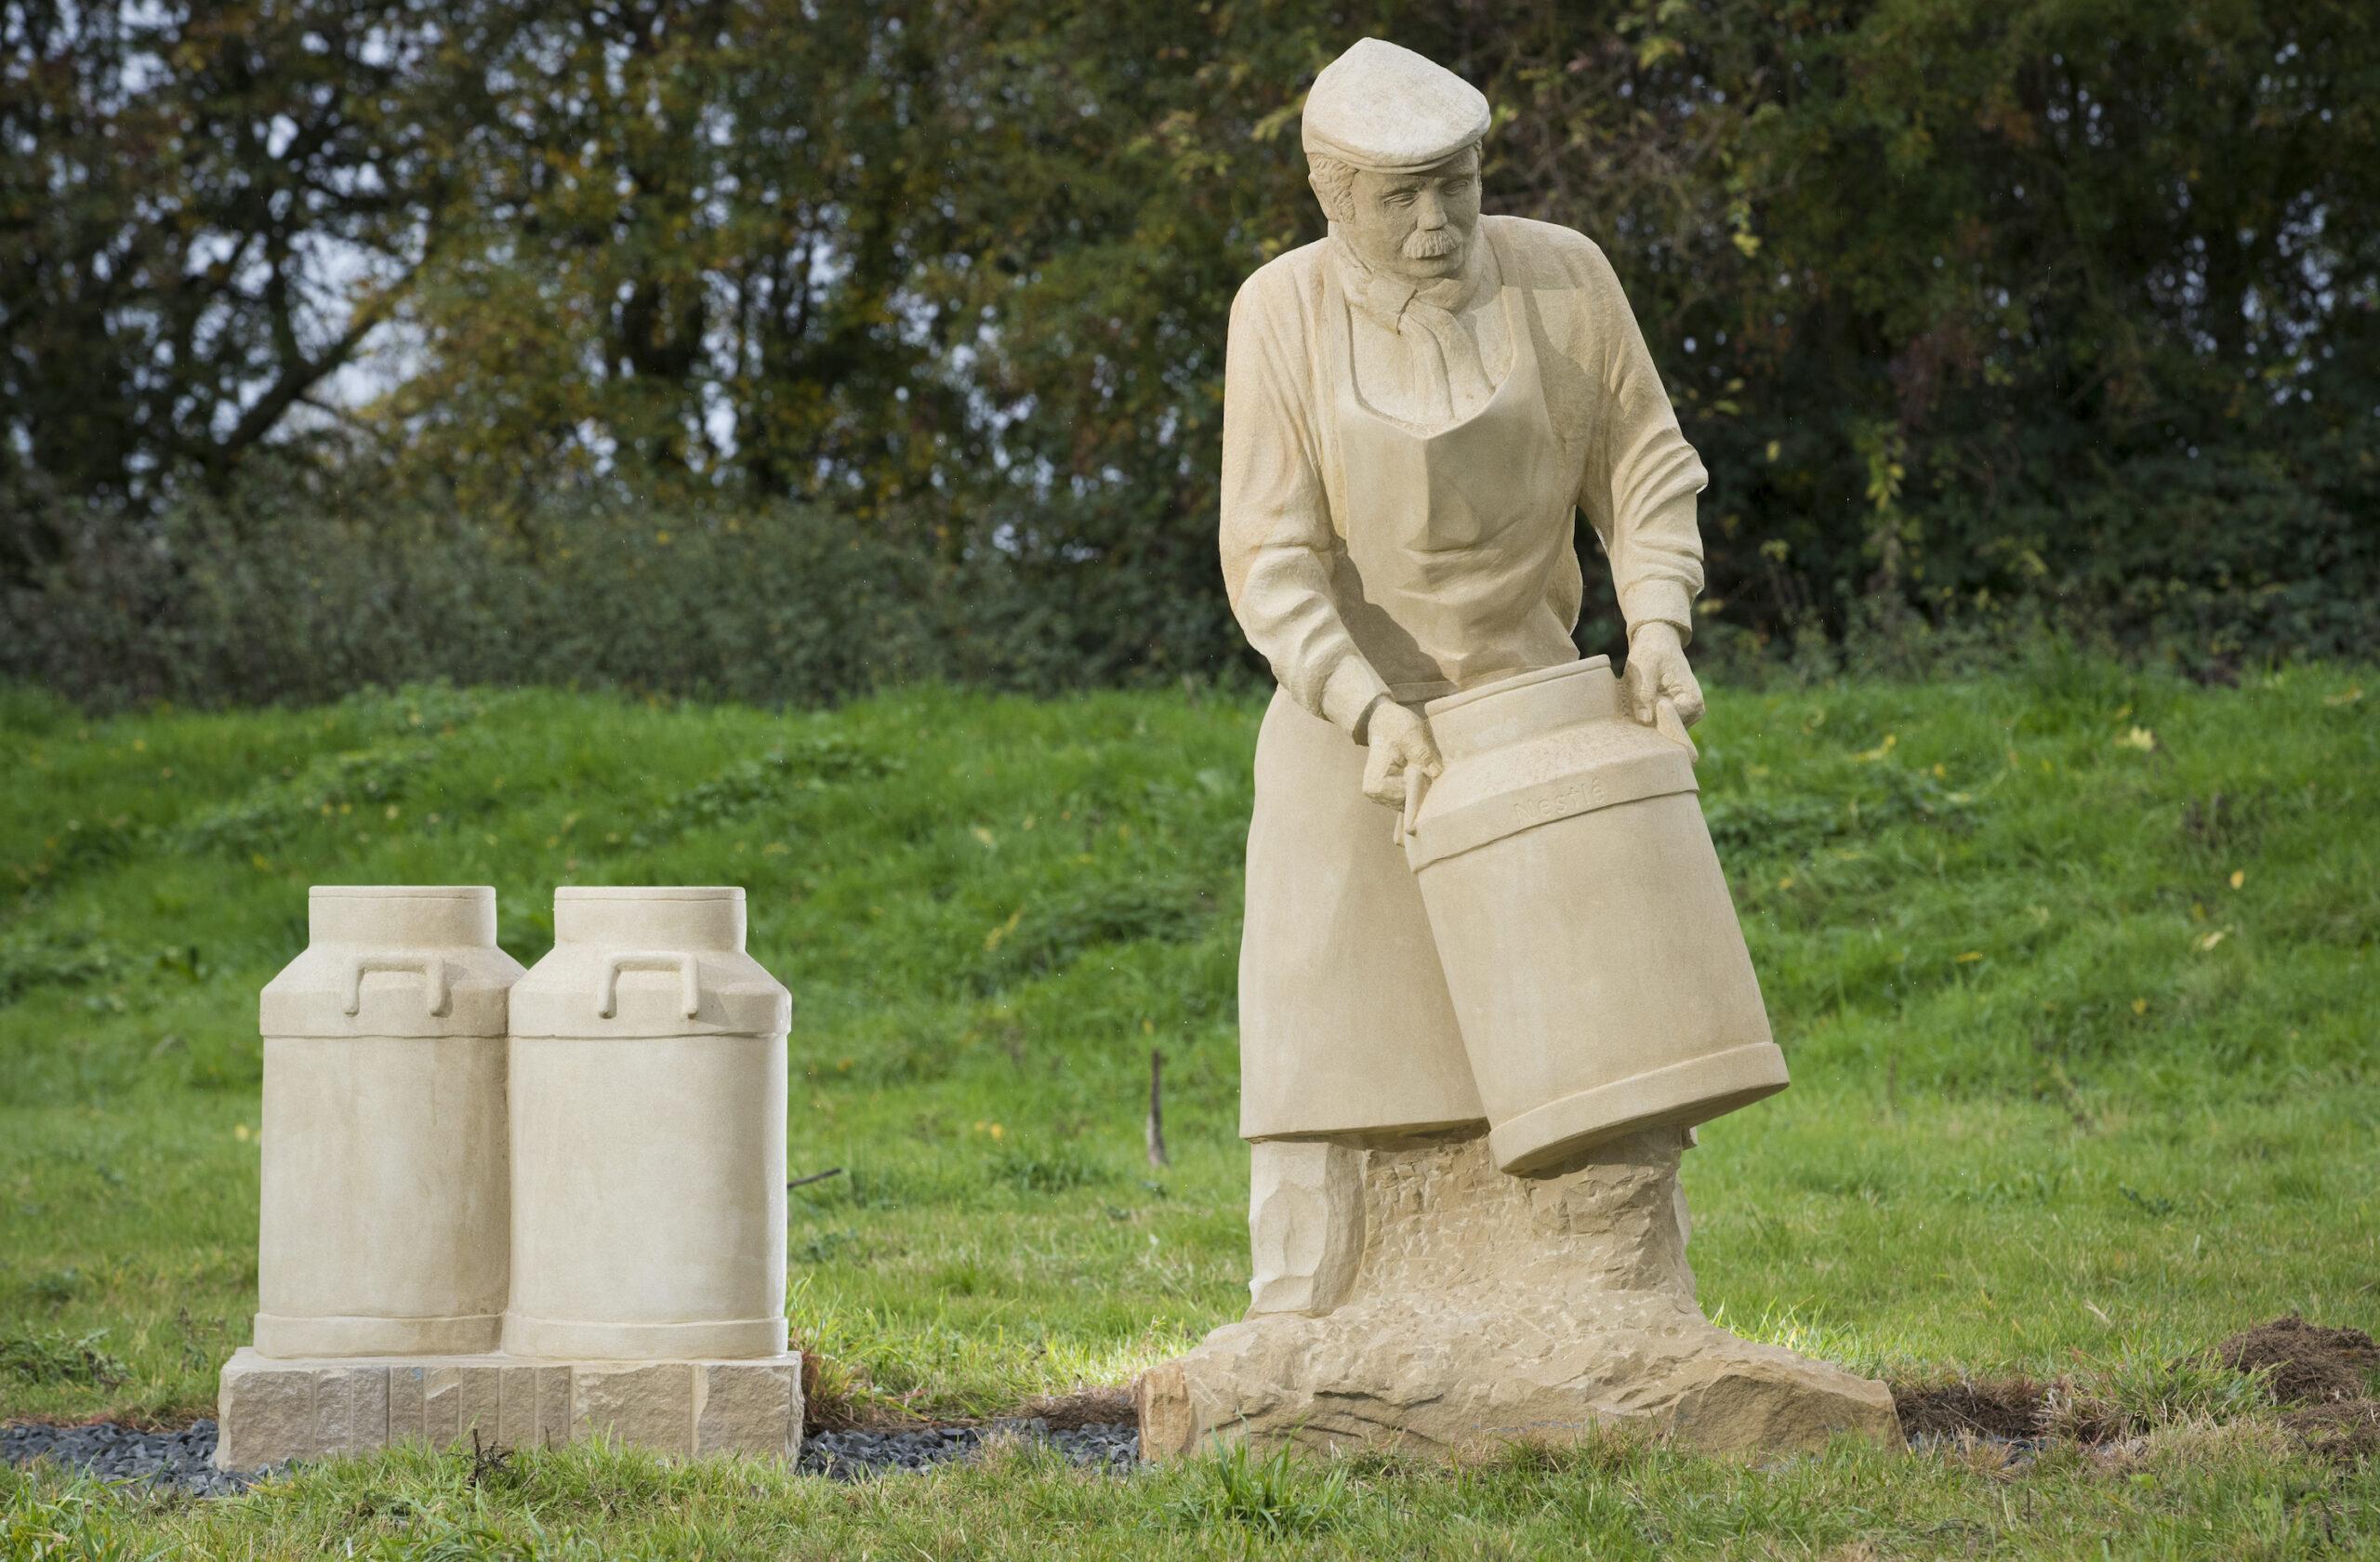 12/10/18  Farmer by Graeme Mitcheson.  The new  sculpture park on the Salt Brook Trail in Hatton, overlooking the NestlÈ factory in Derbyshire.  All Rights Reserved, F Stop Press Ltd. (0)1335 344240 +44 (0)7765 242650  www.fstoppress.com rod@fstoppress.com